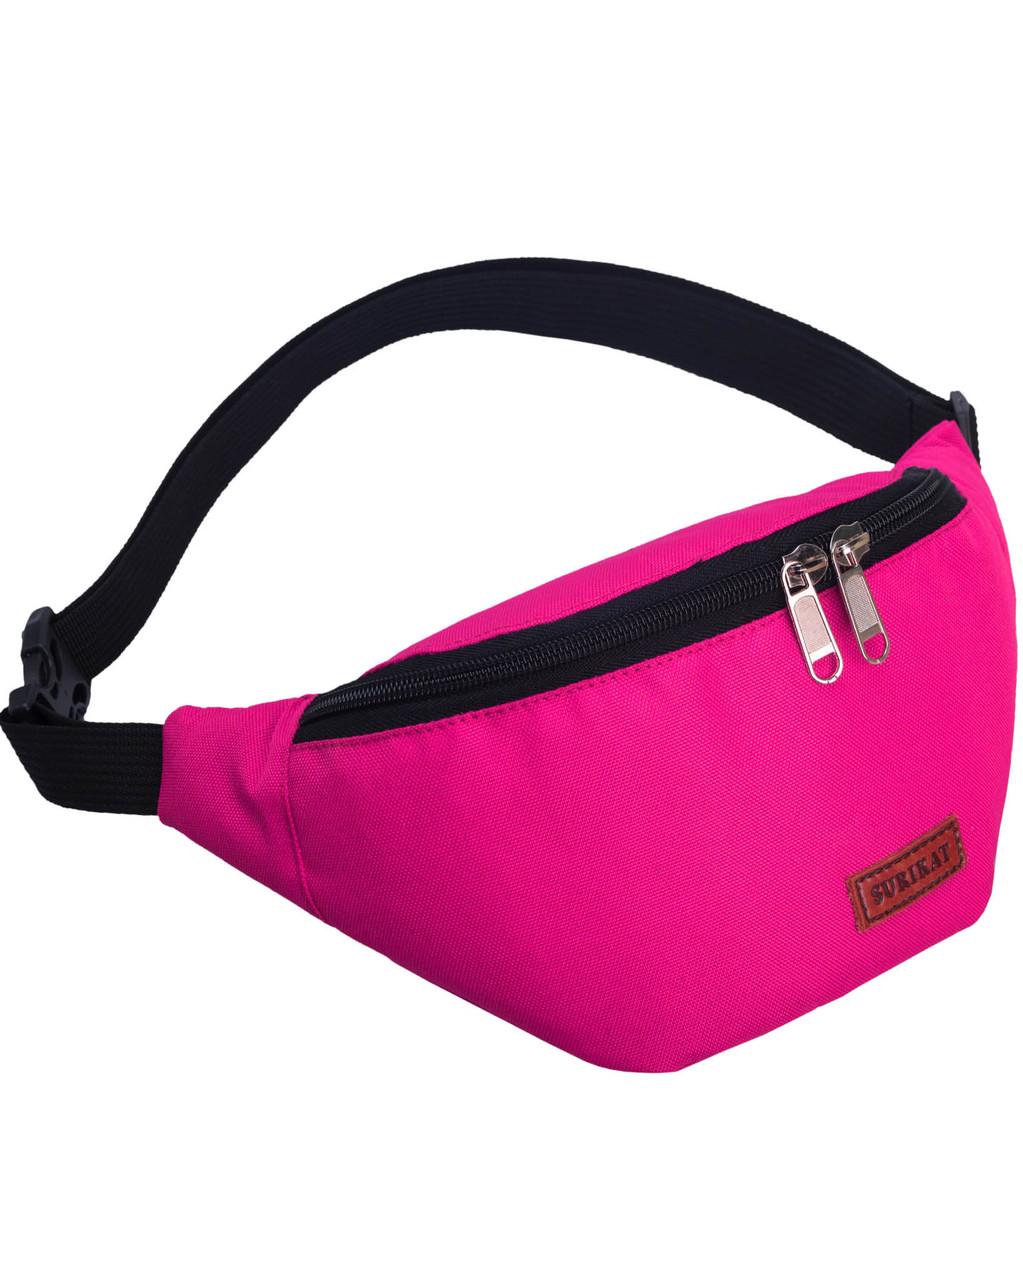 Сумка на пояс бананка Tempo Surikat розовая (сумка на пояс, сумки, сум